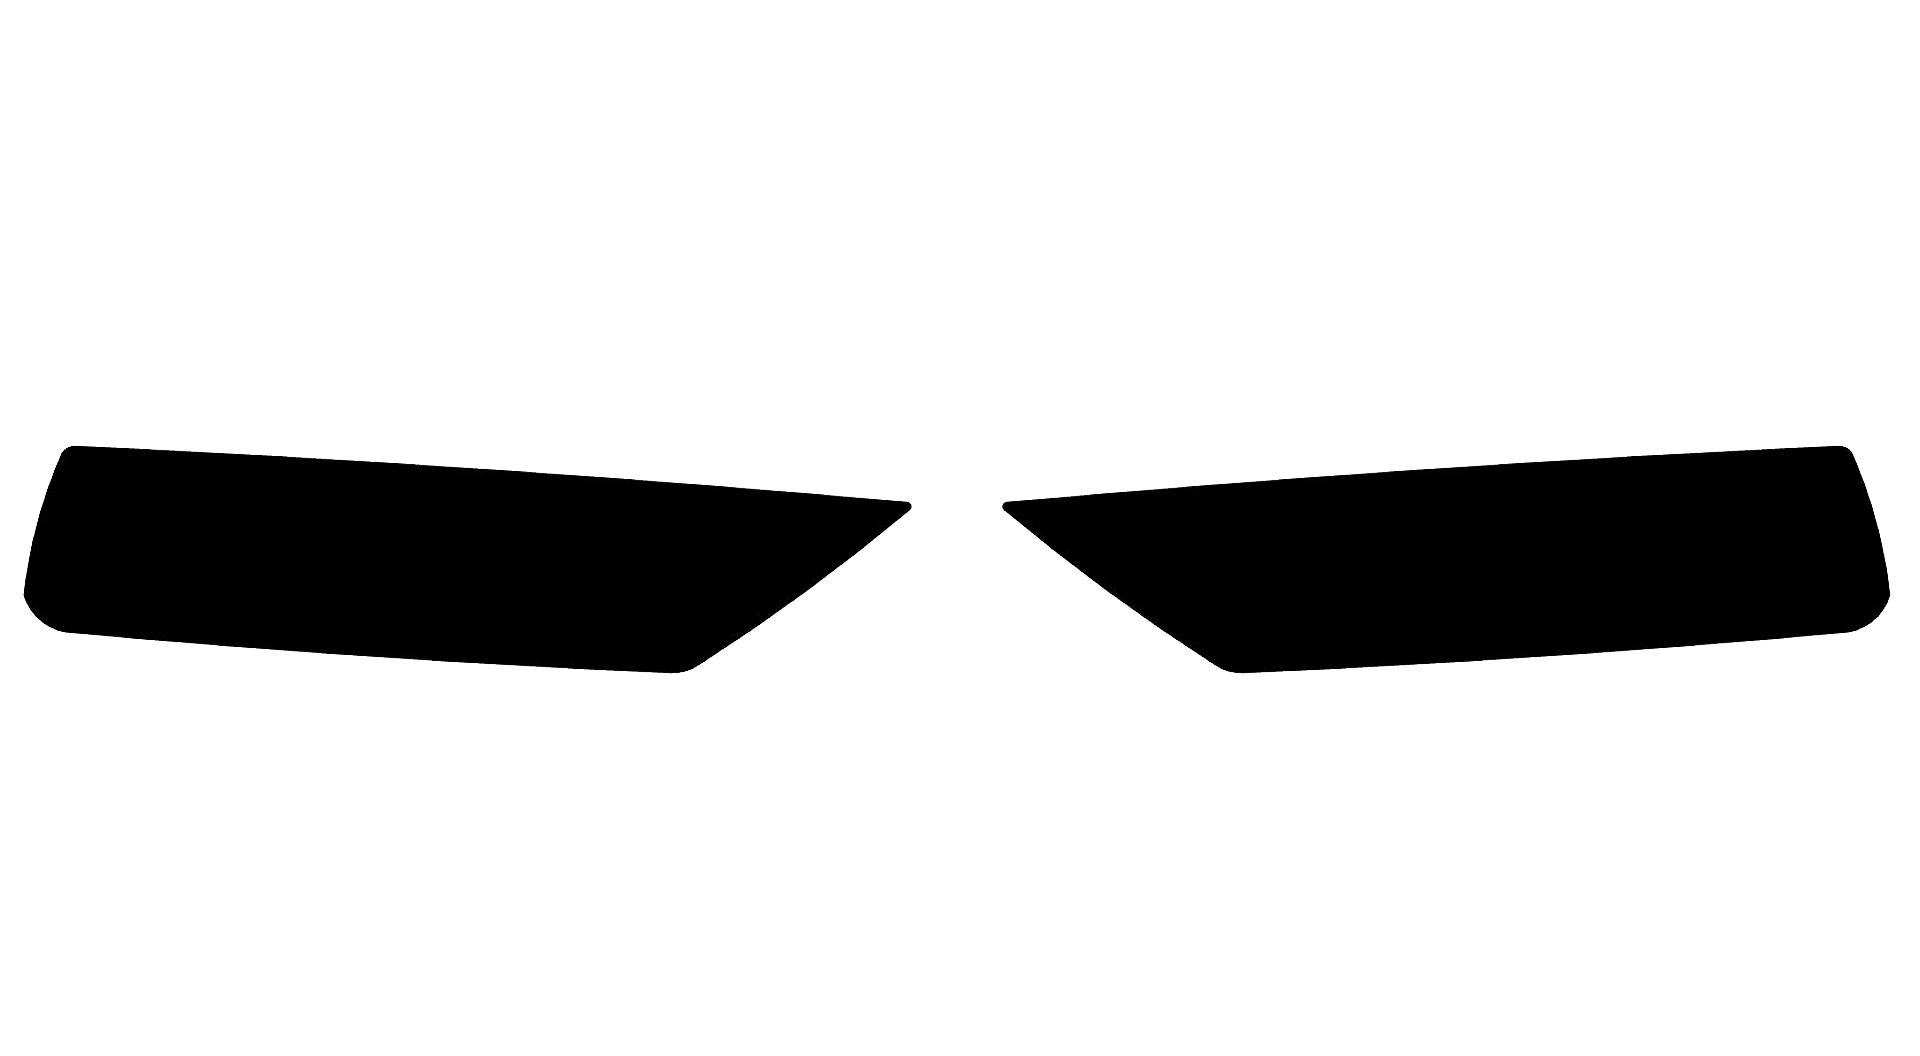 volkswagen tiguan 2018-2018 fog light tint diagram